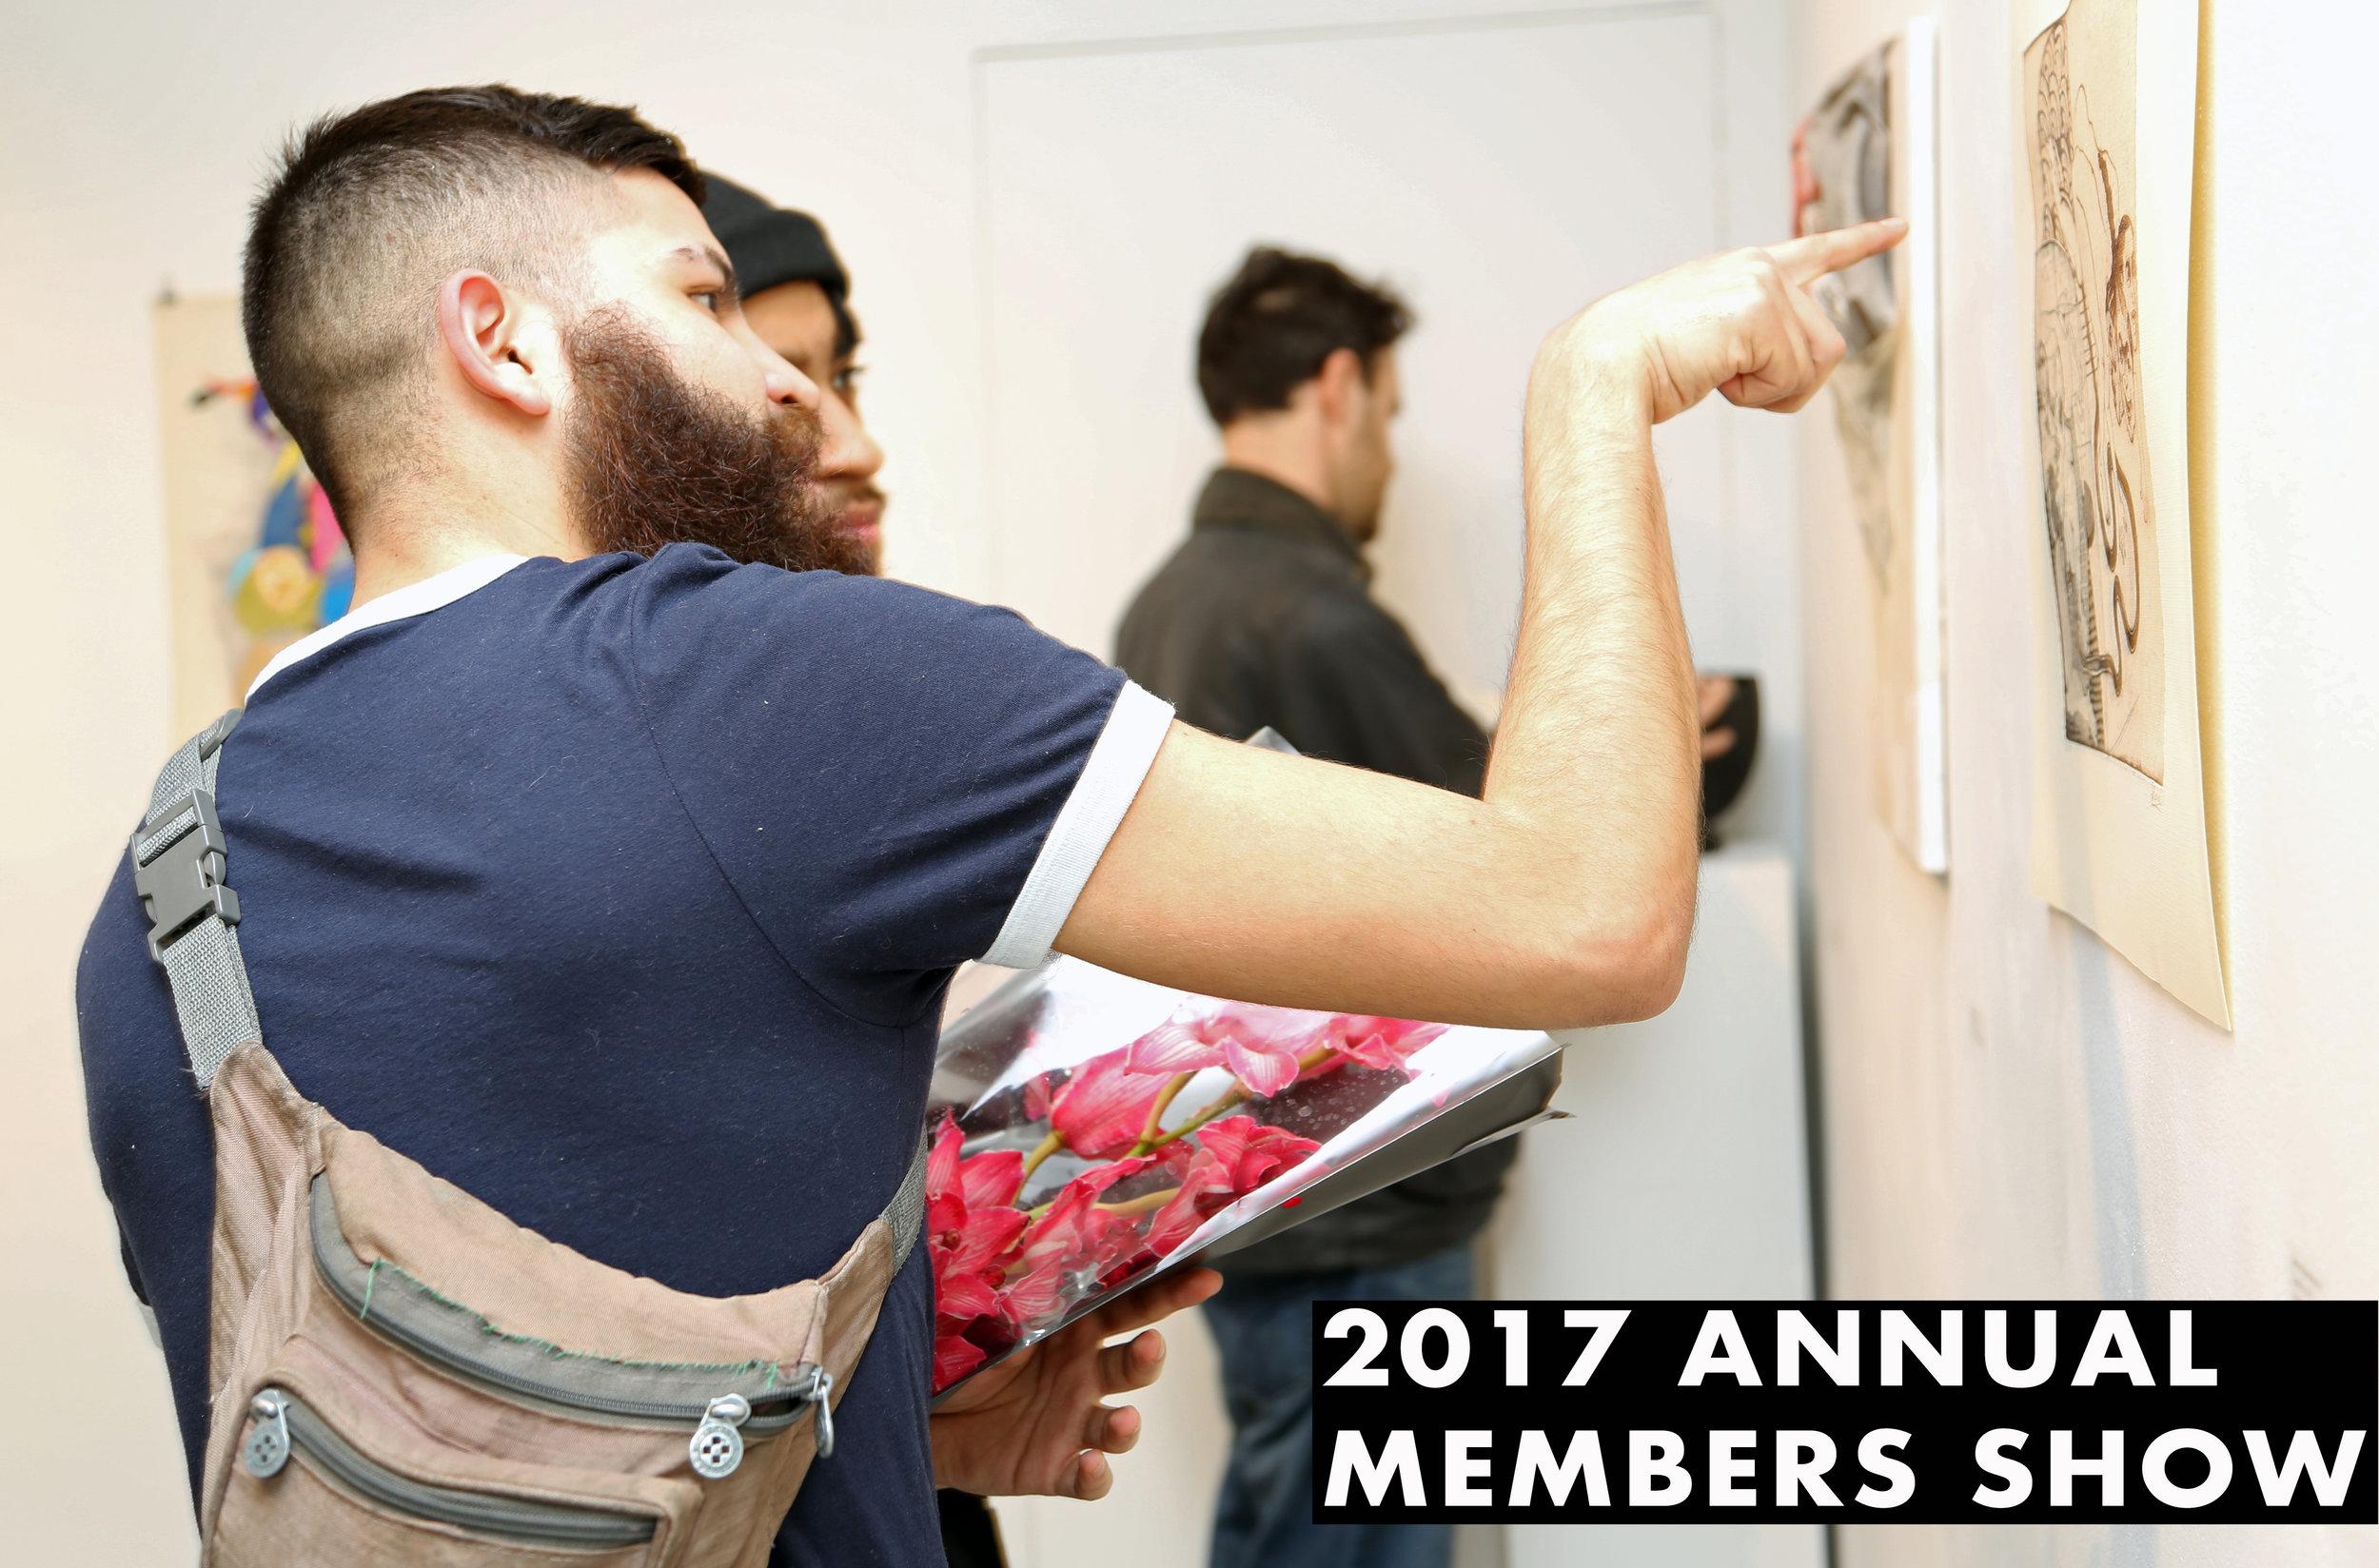 Members Show  October 11 - October 22, 2017